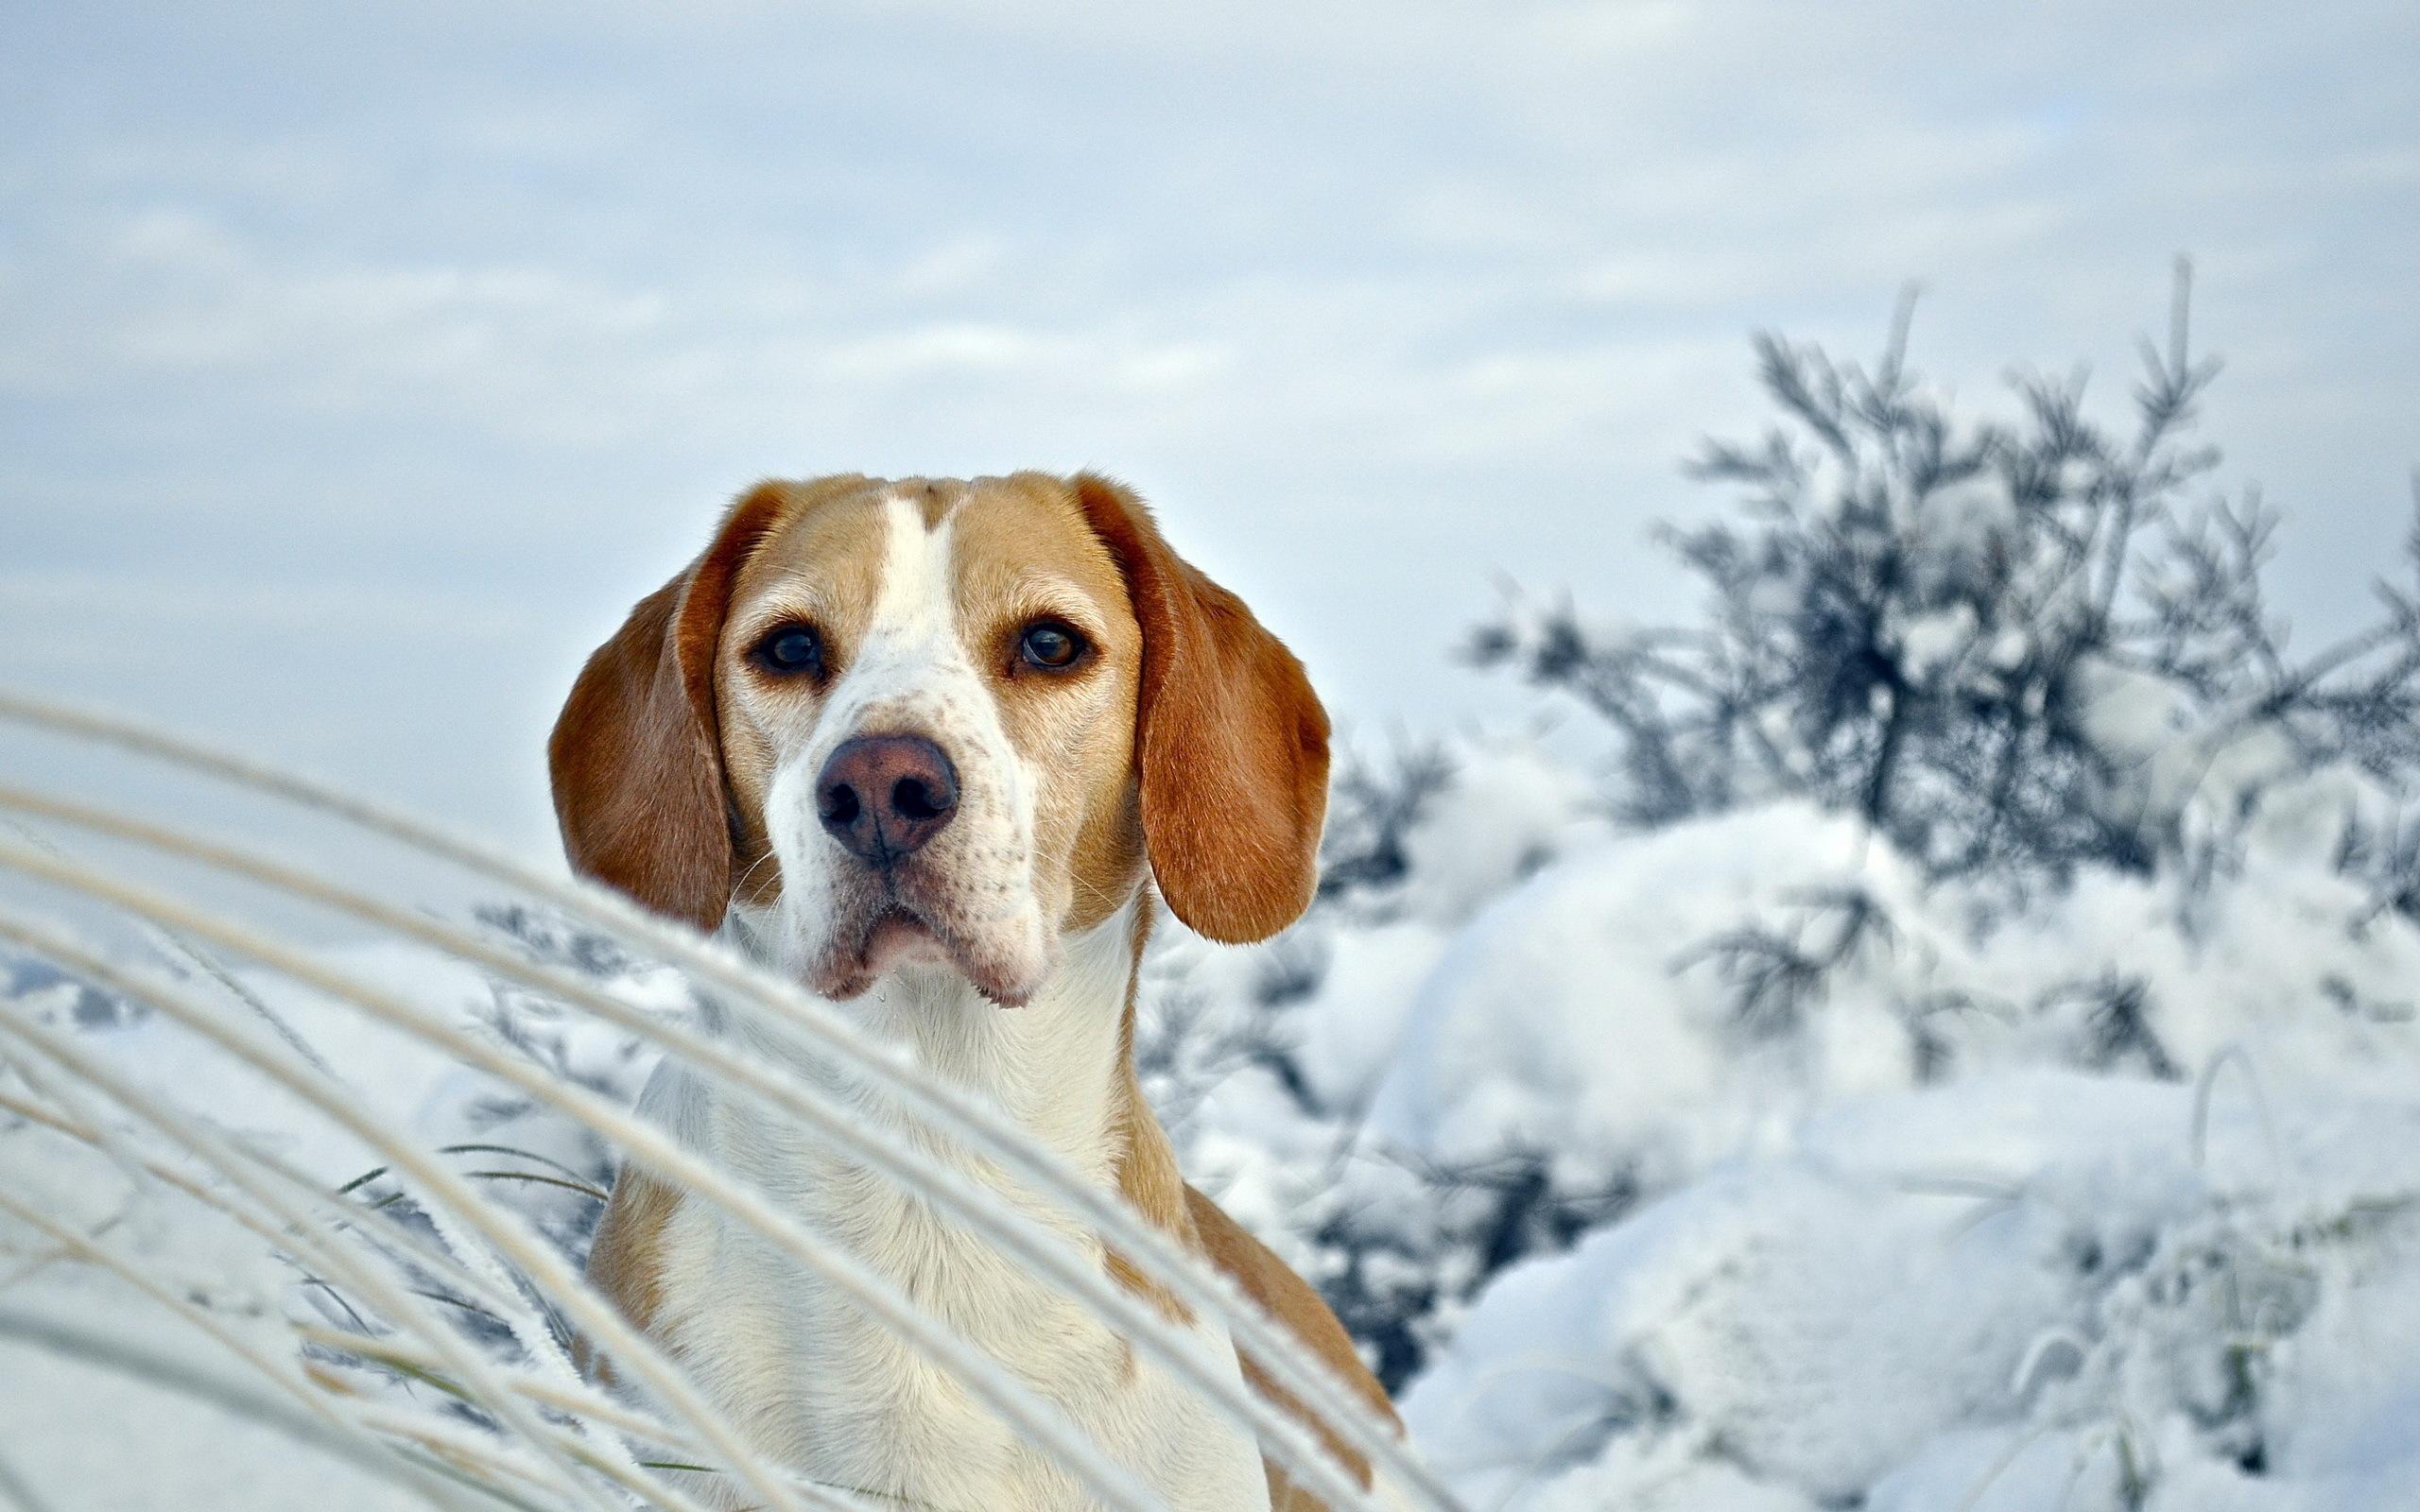 щенок снег puppy snow  № 2001714 загрузить